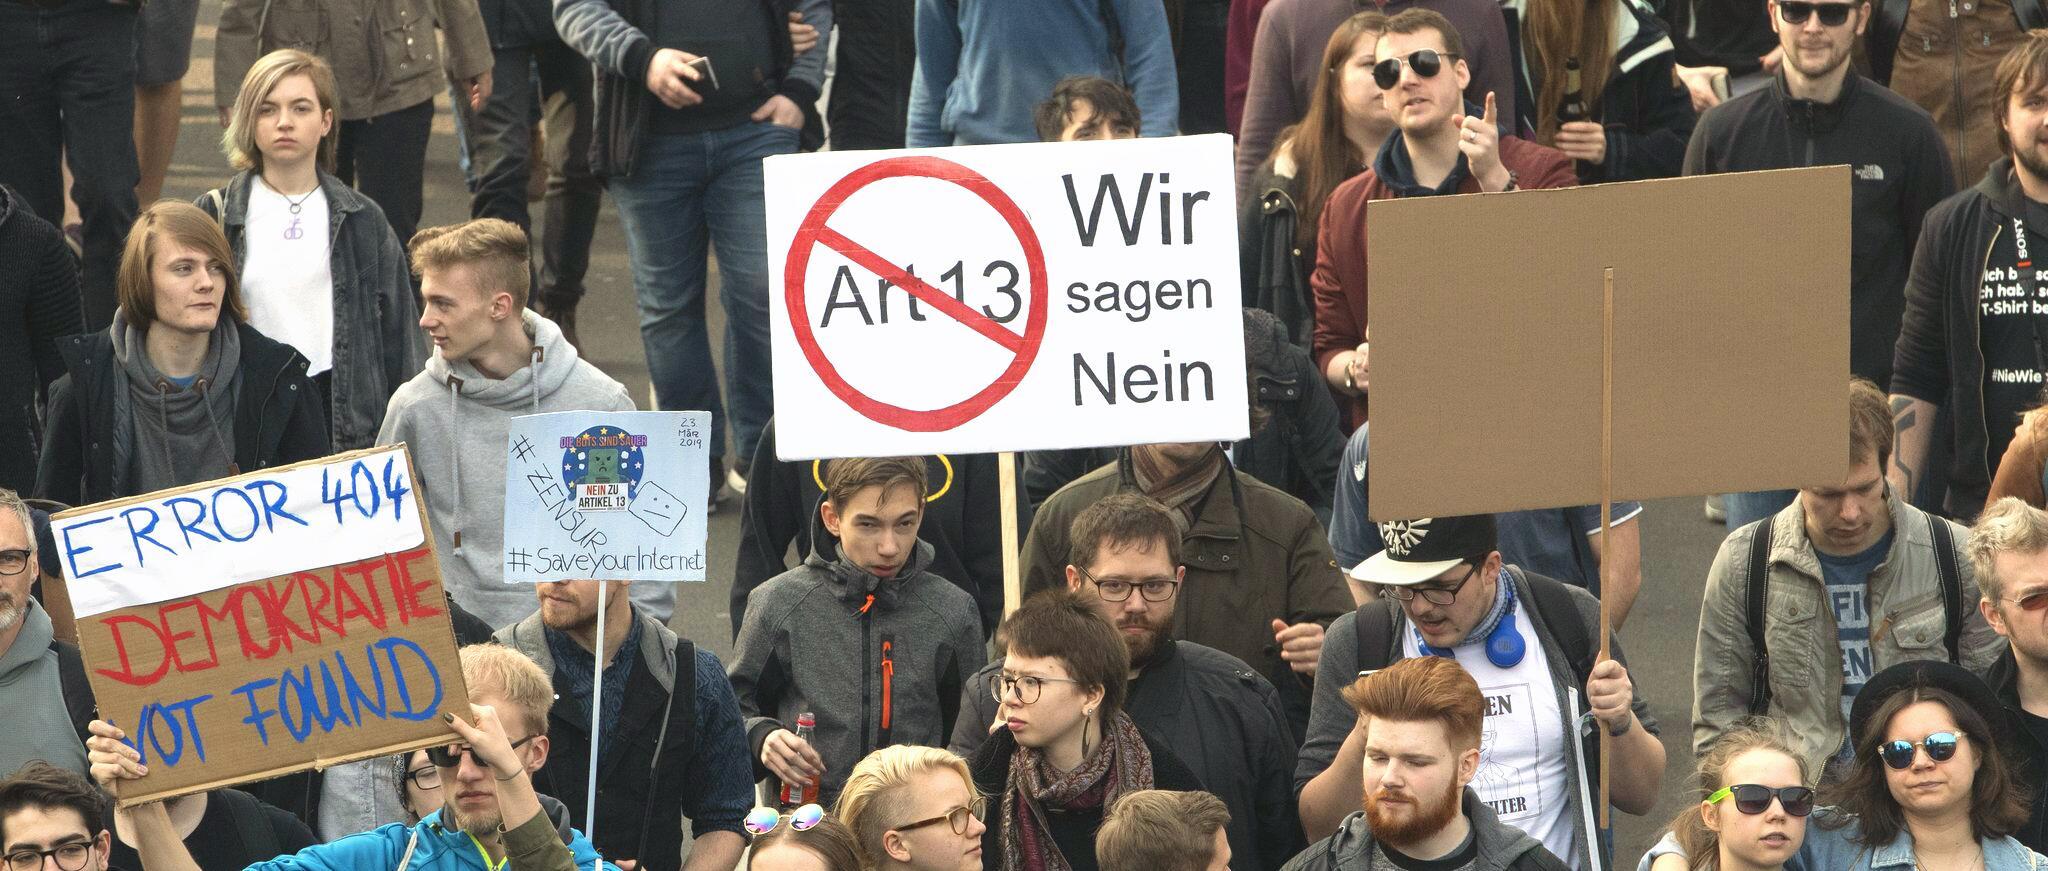 Bild zu Protest gegen neues Urheberrecht - Berlin